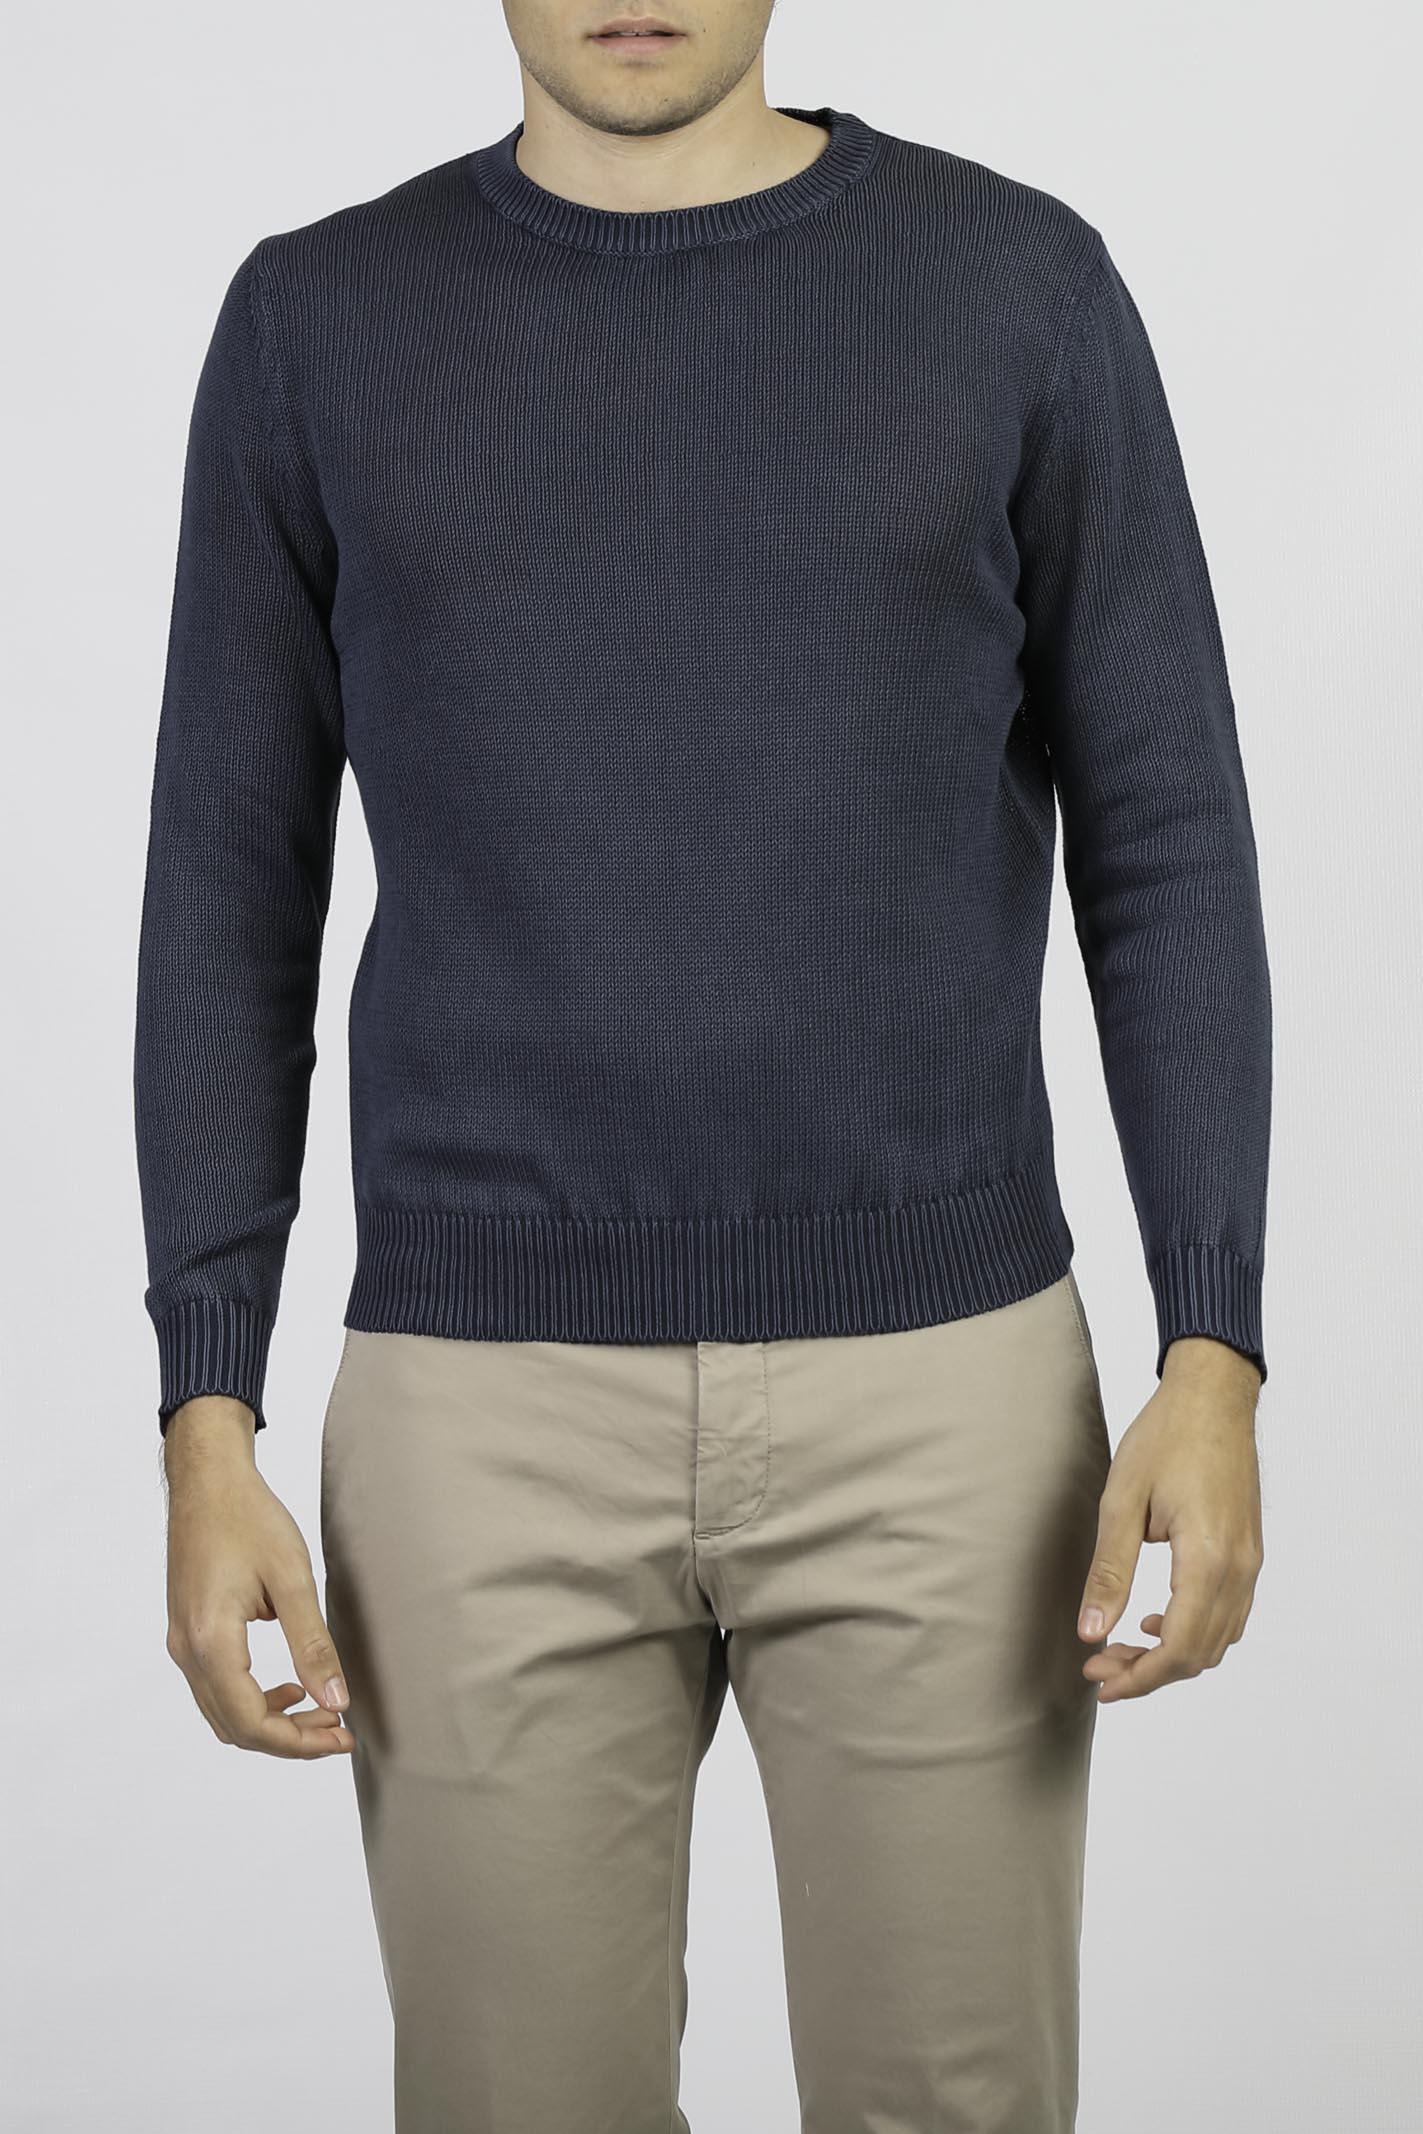 COTTON CREW NECK SWEATER FRANCESCO PIERI | Knitwear | FU54000NAVY